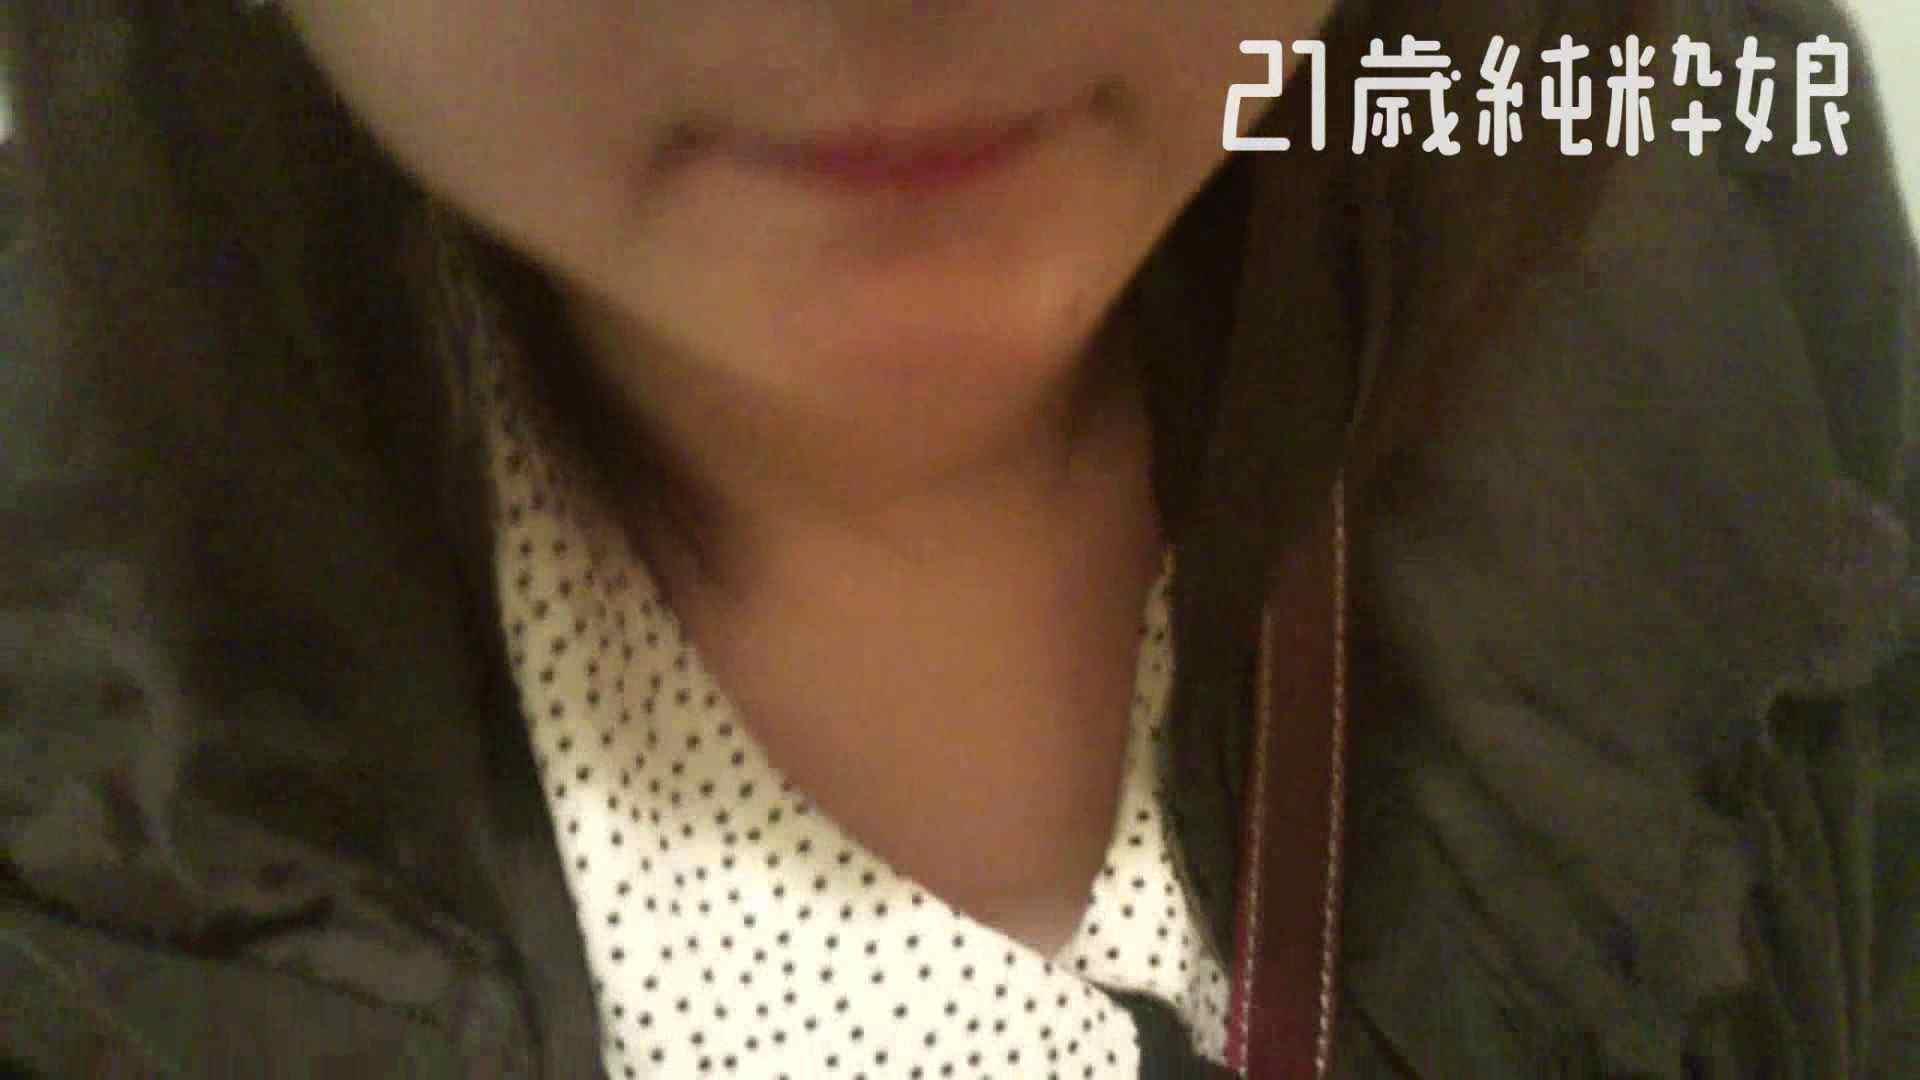 Gカップ21歳純粋嬢第2弾Vol.5 性欲丸出し | 学校  101pic 80